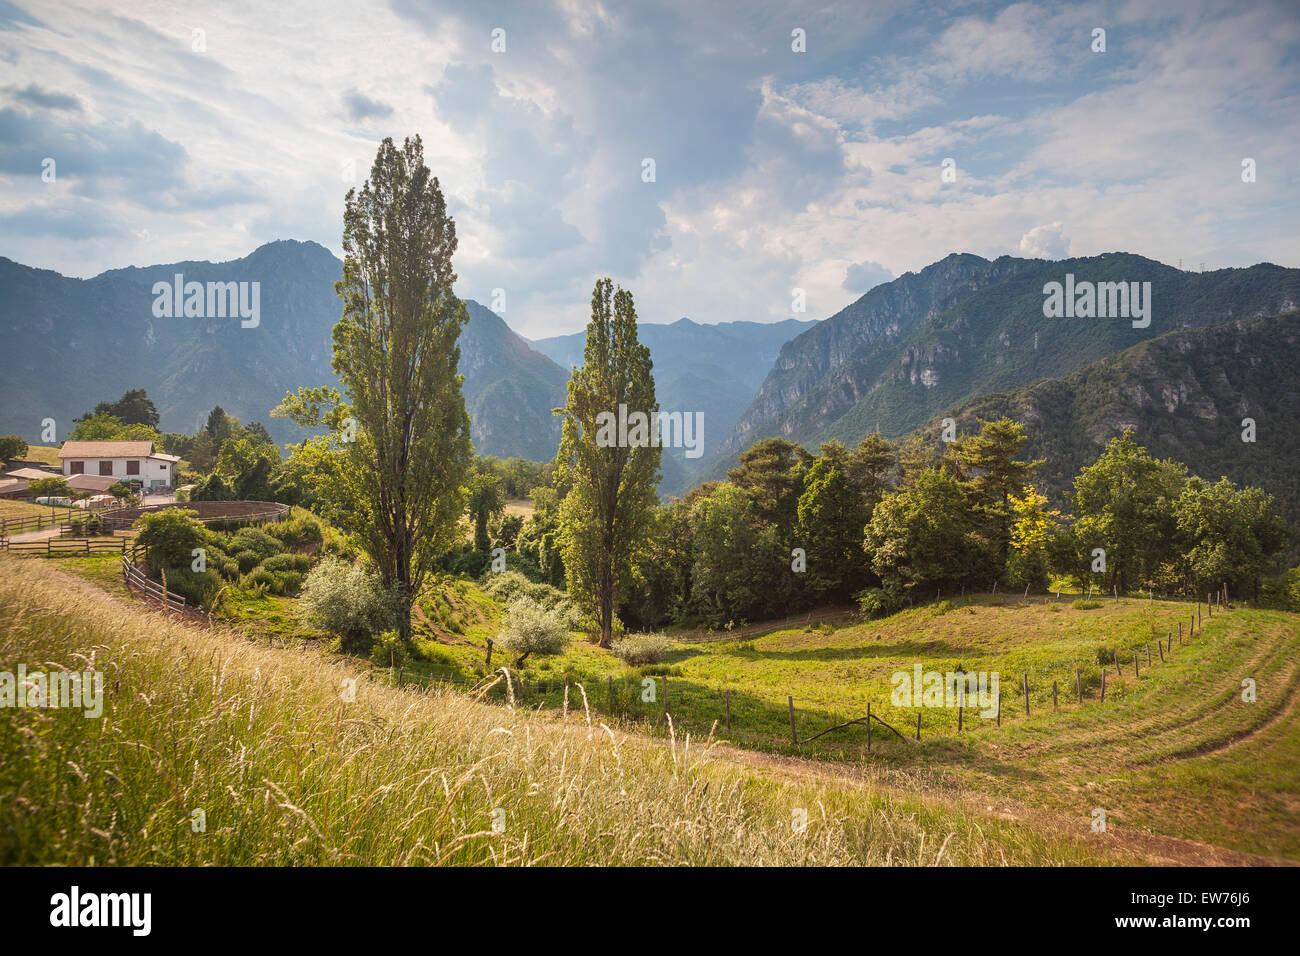 Agriturismo Nai, Nature Reserve Alto Garda Bresciano, Italy - Stock Image